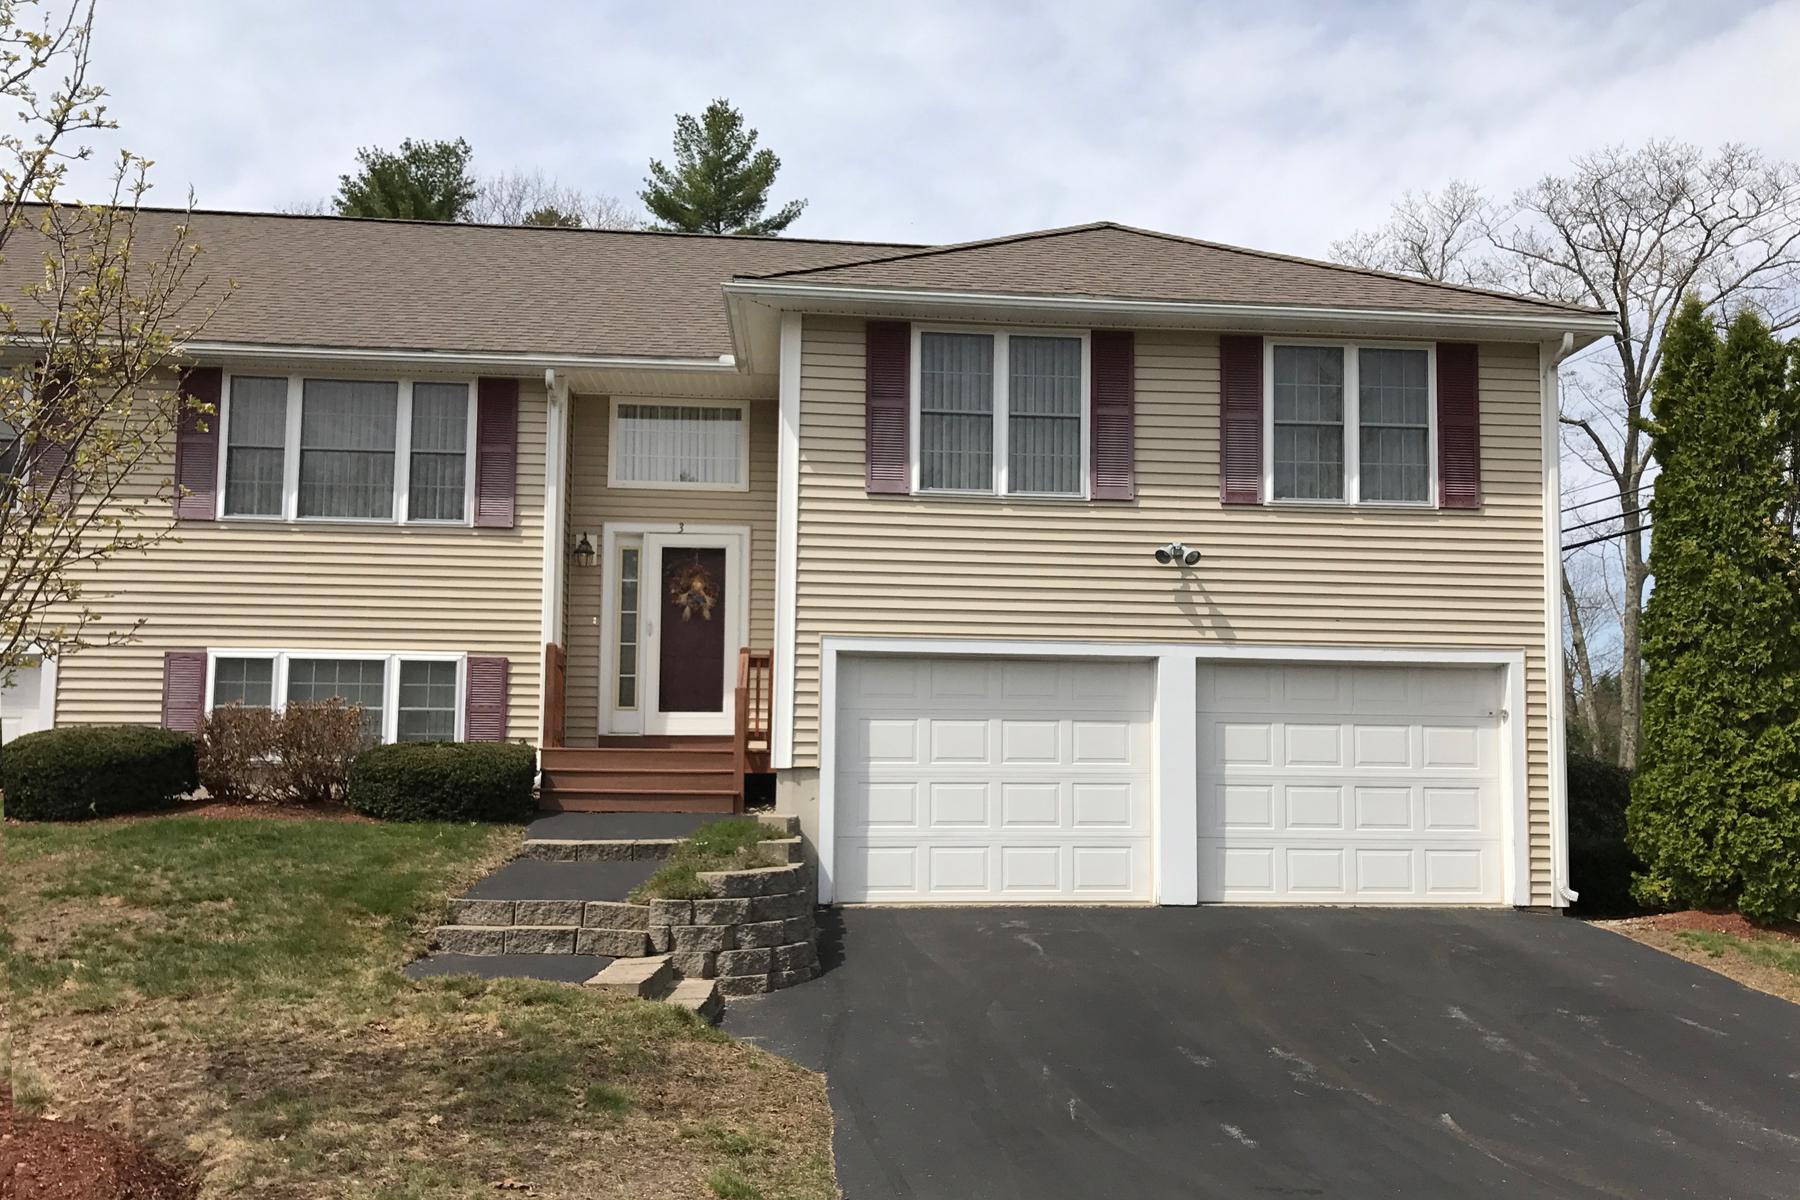 Condominium for Sale at 3 Nathaniel Drive 1, Raymond 3 Nathaniel Dr 1 Raymond, New Hampshire 03077 United States